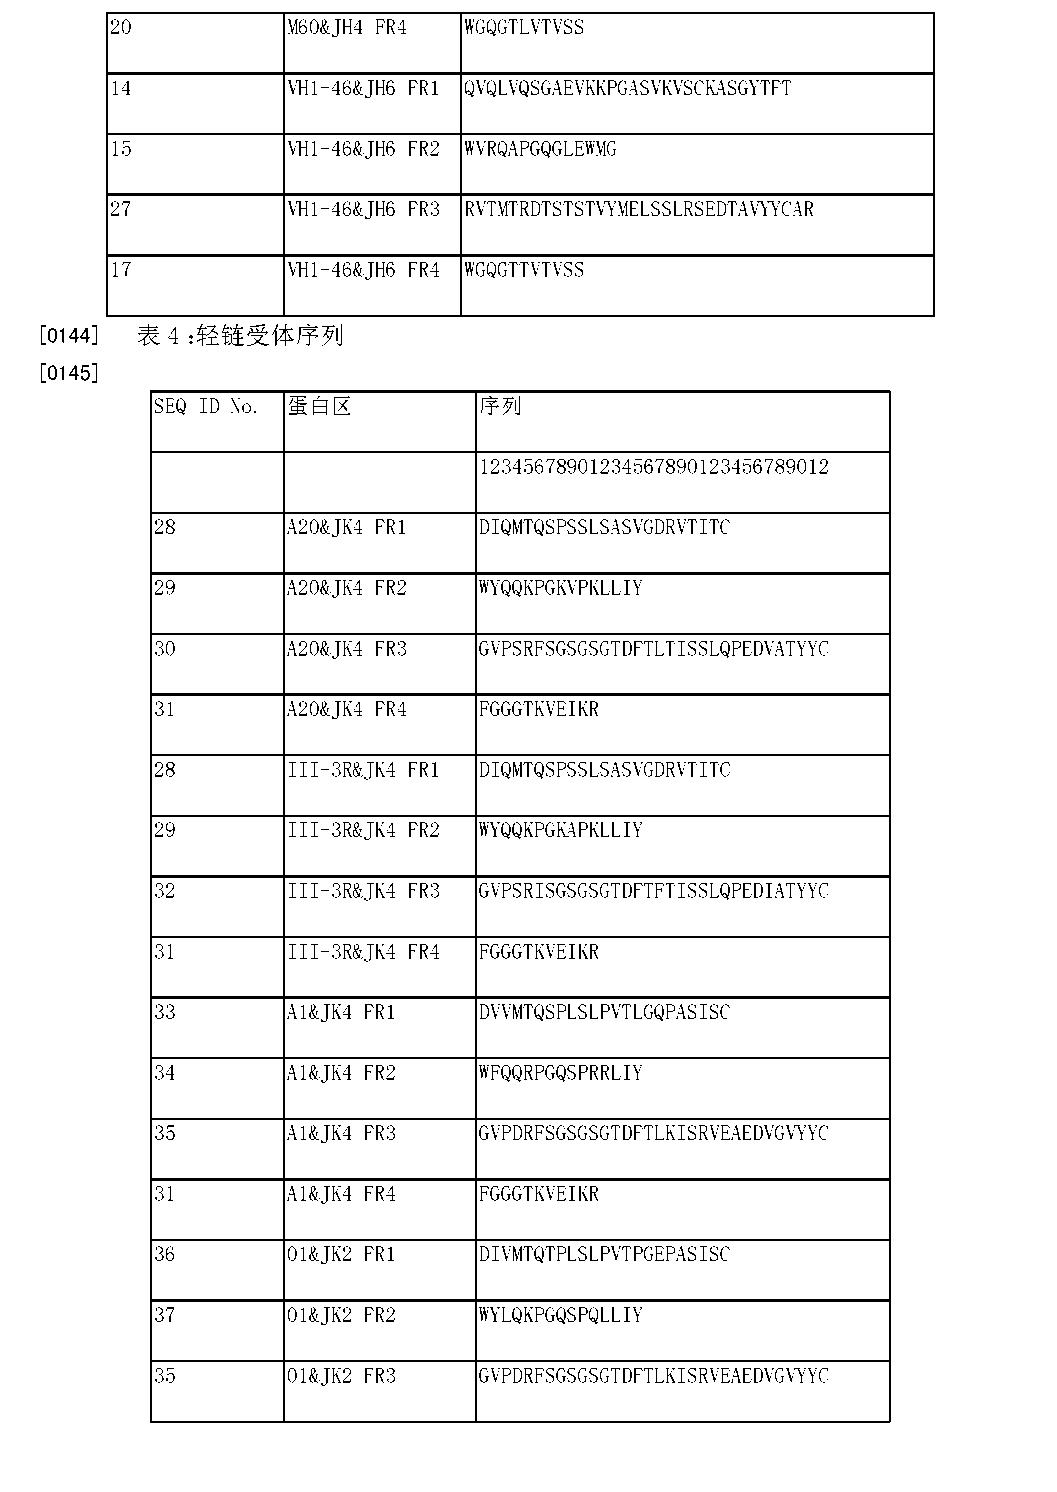 CN105102480A - Prolactin receptor binding proteins and uses